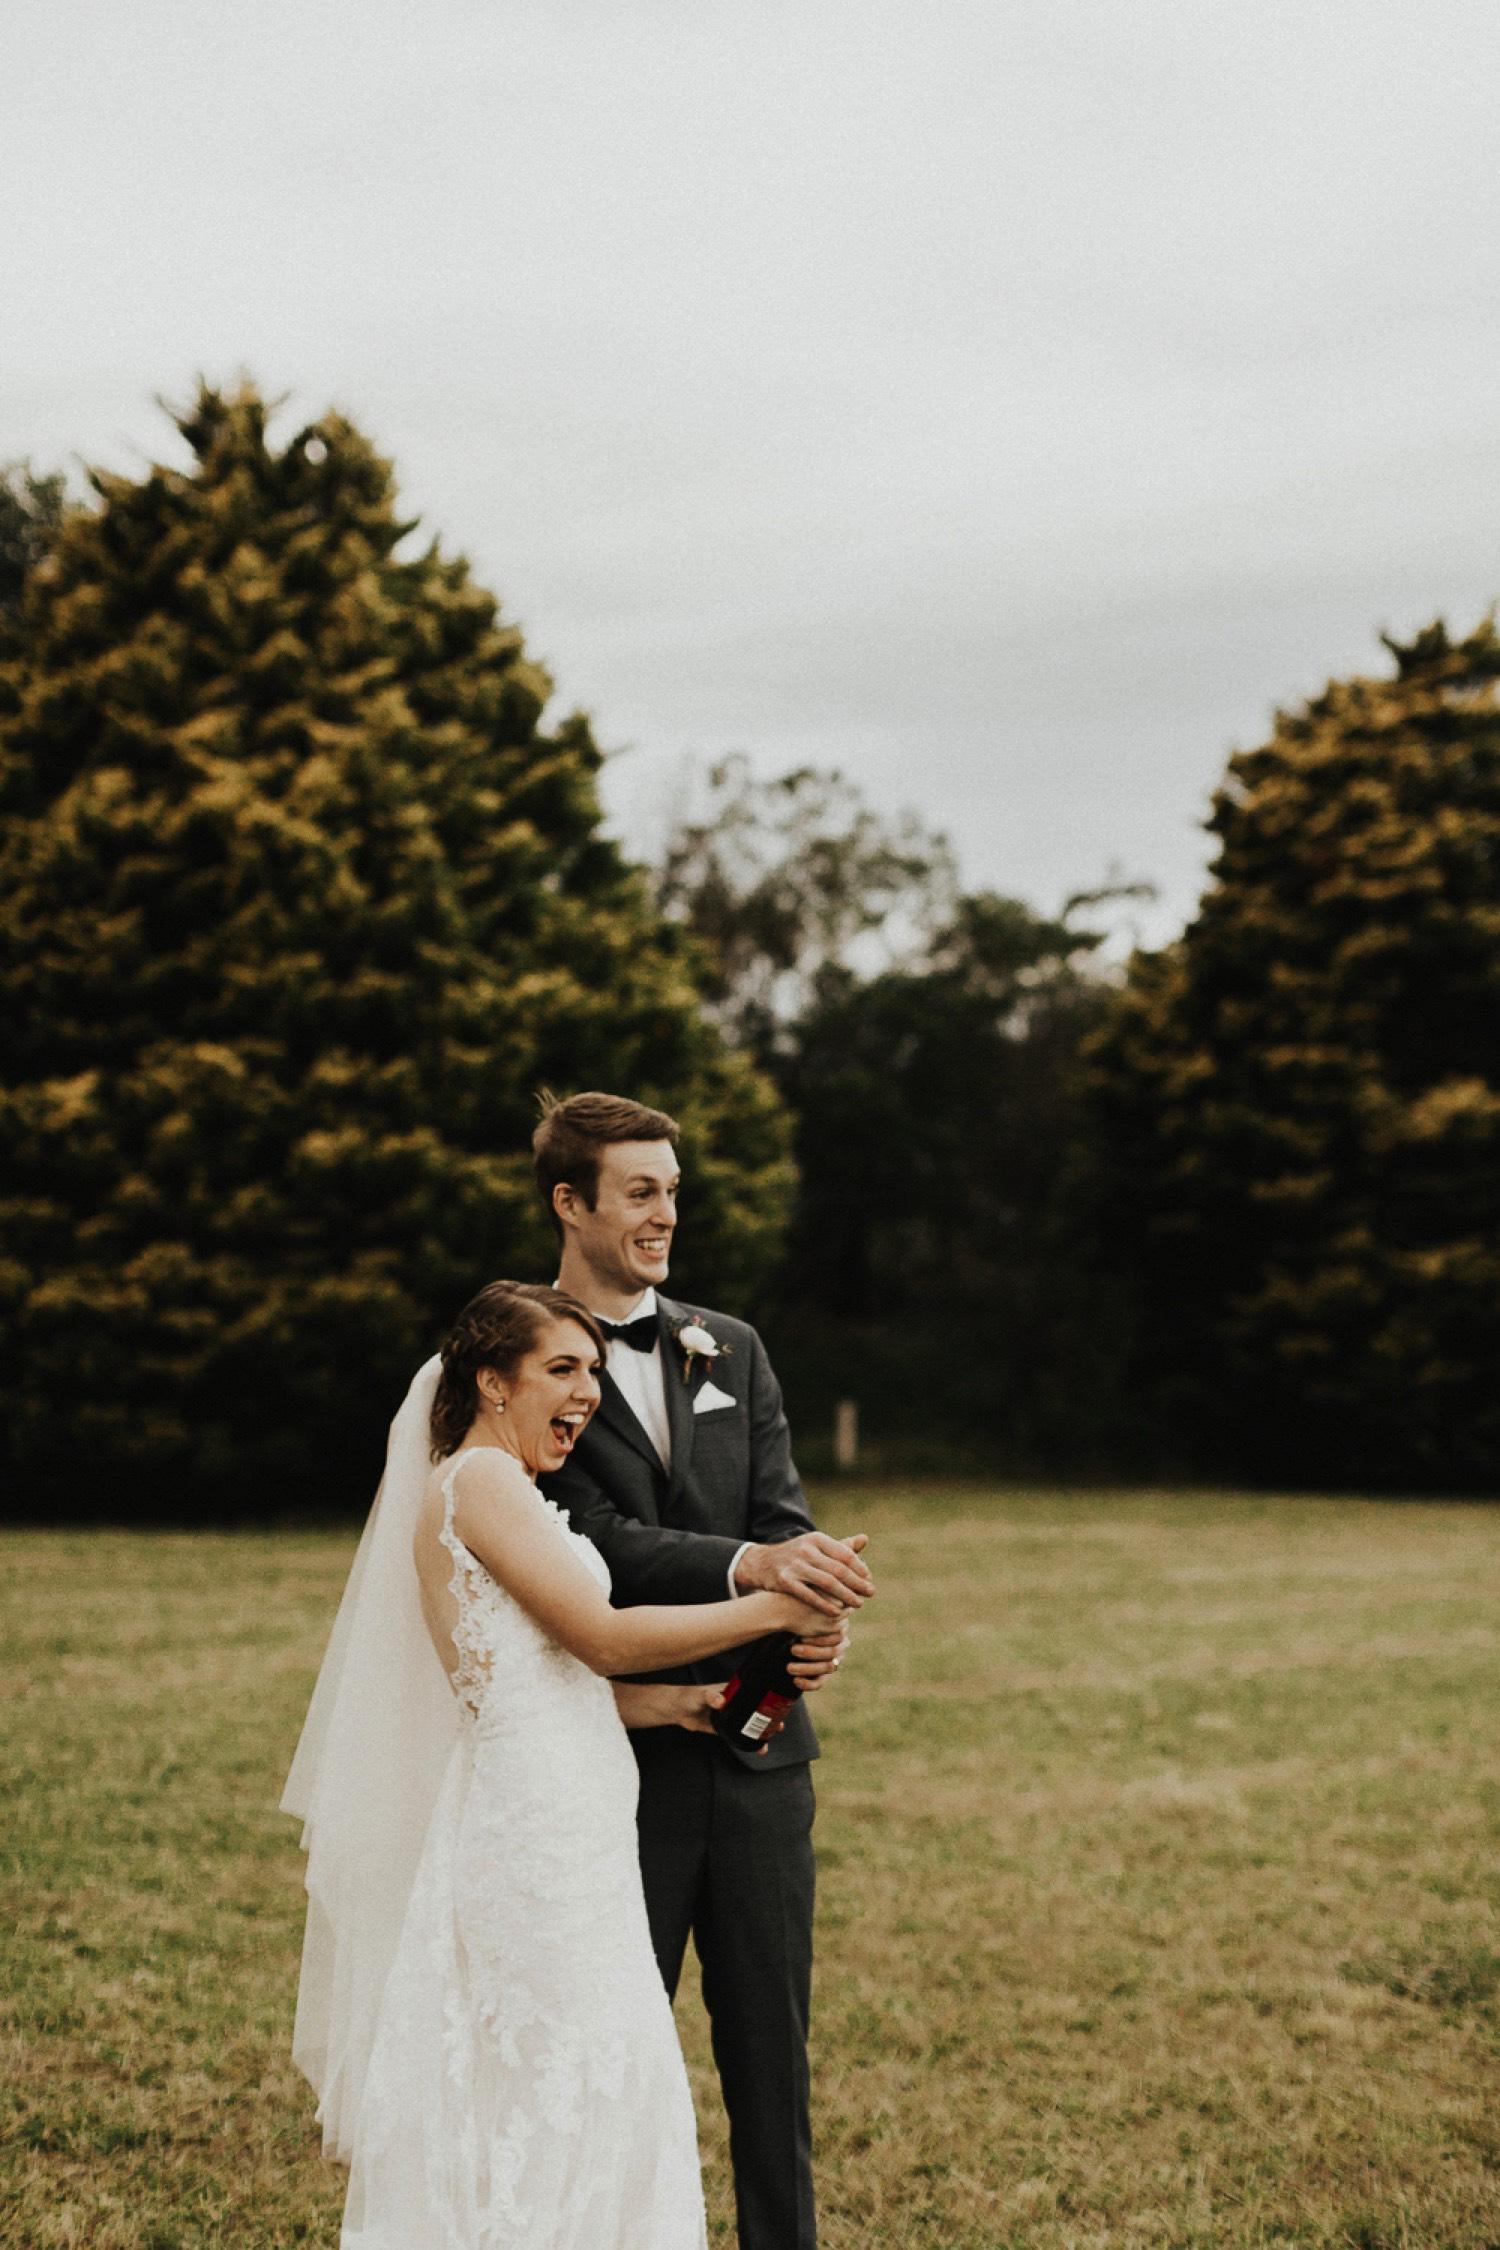 Rustic Country Wedding Photography 66.jpg